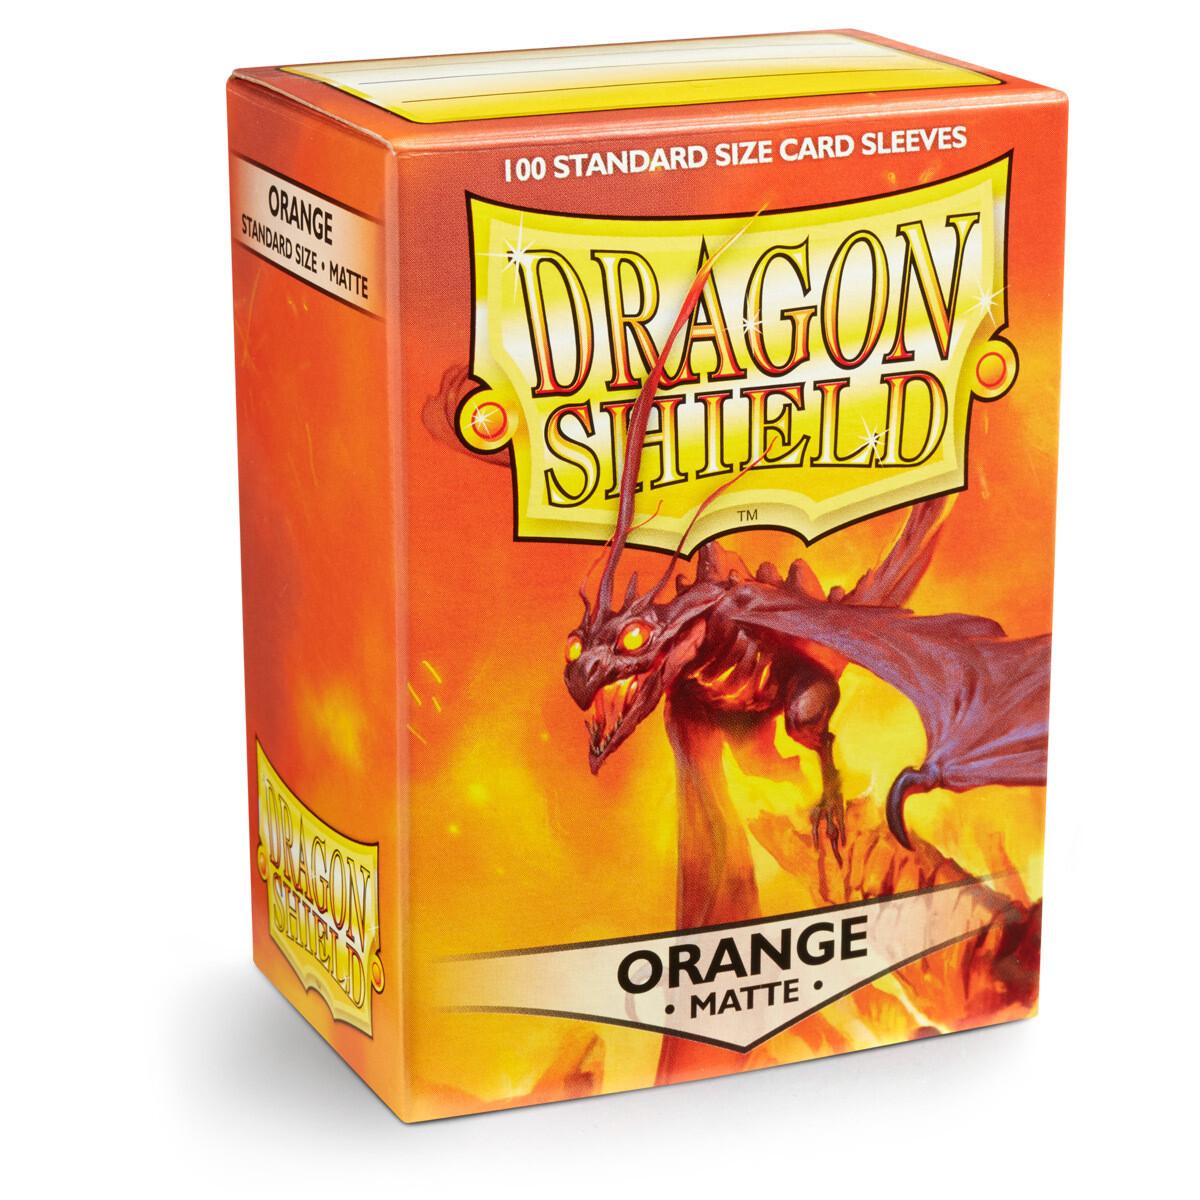 Dragon Shield 100 Sleeves - Matte Orange